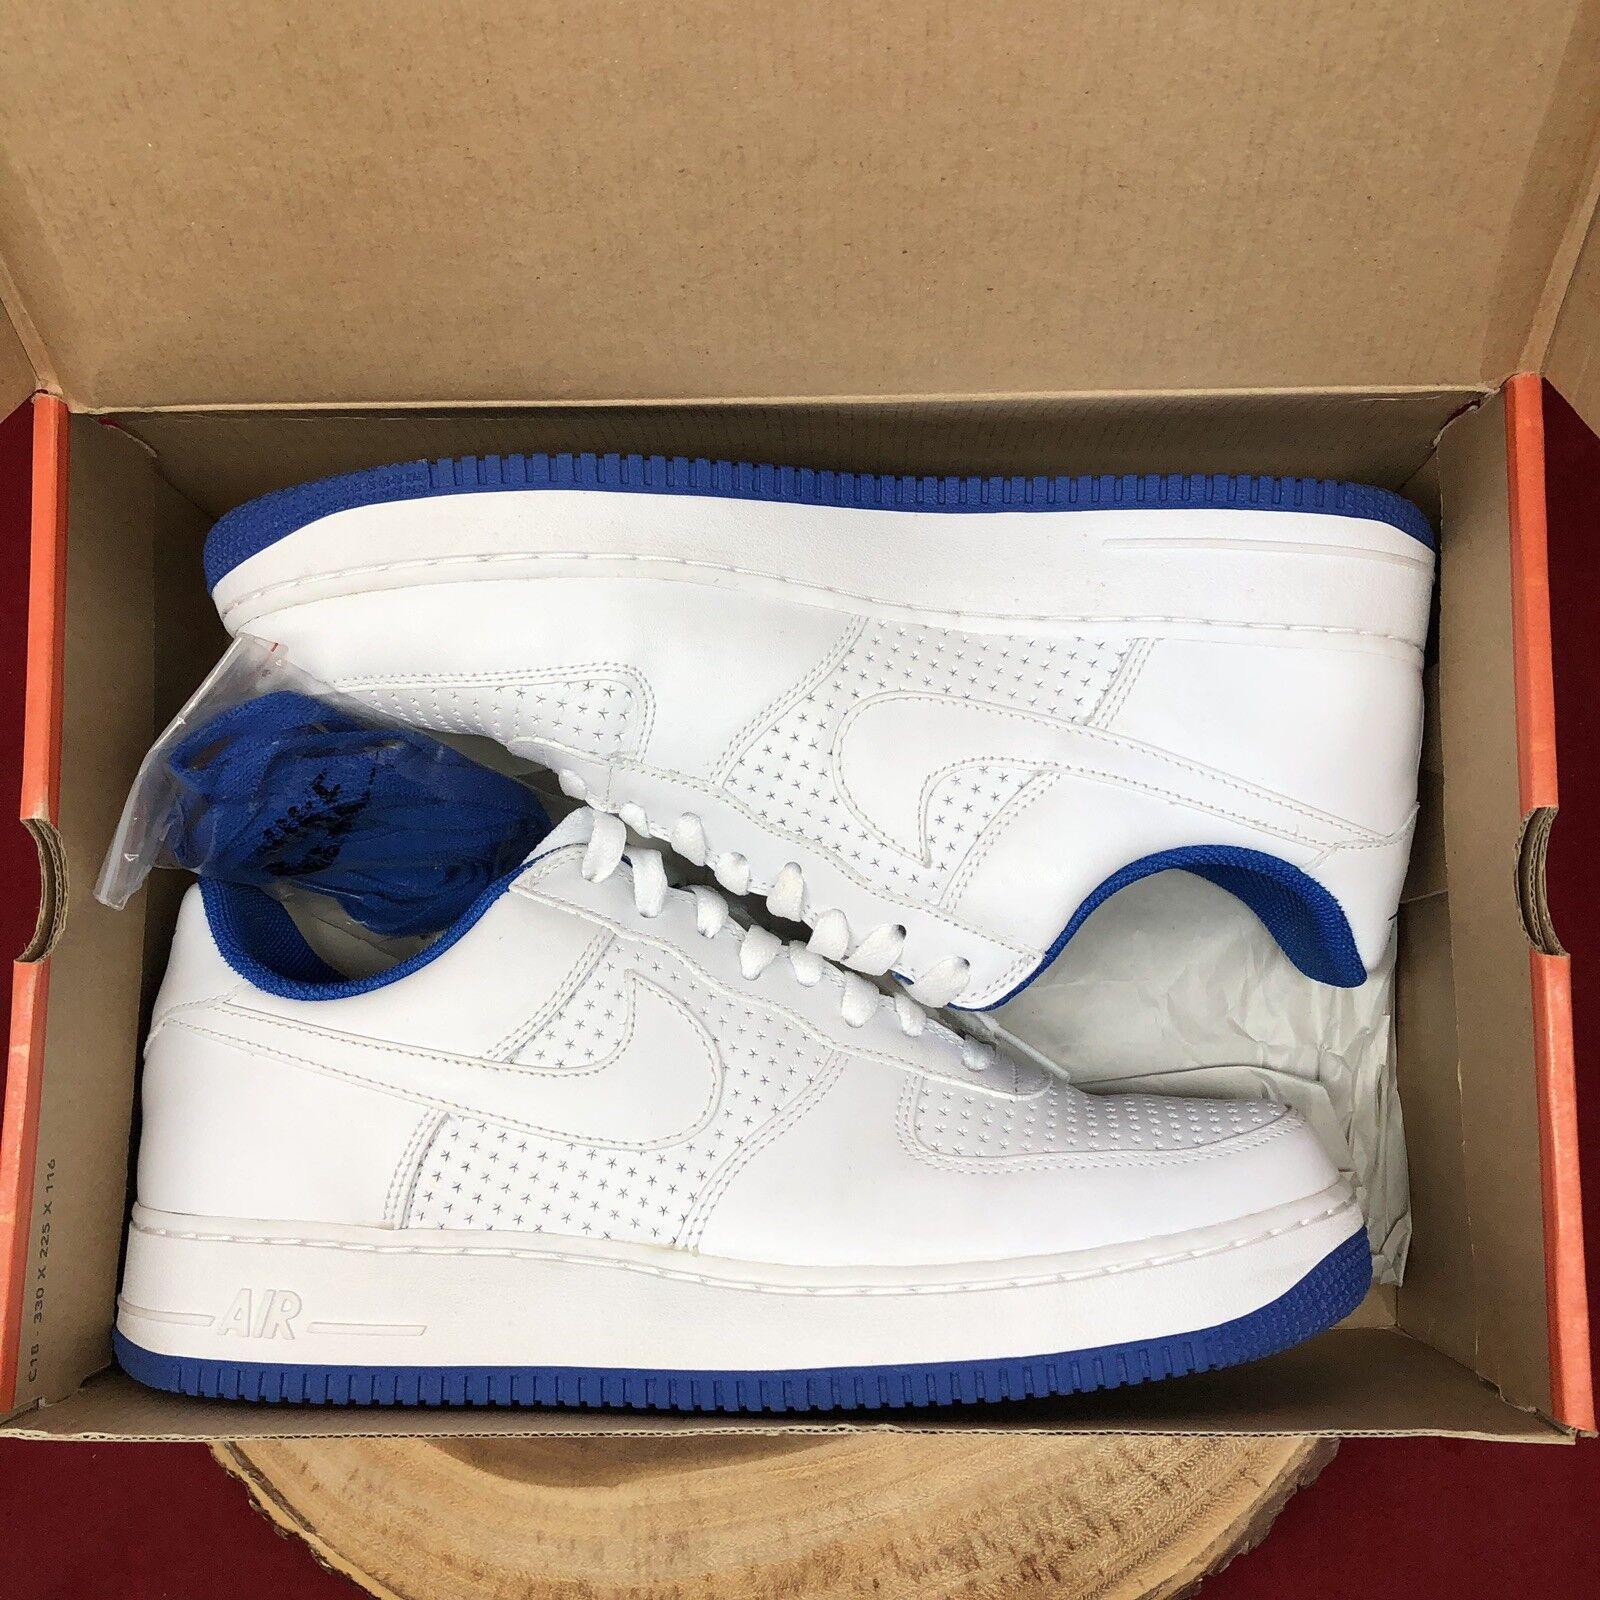 06 Nike Air Force 1 WHITE VARSITY ROYAL blueeE PERFORATED PERF STARS 313642-141 11